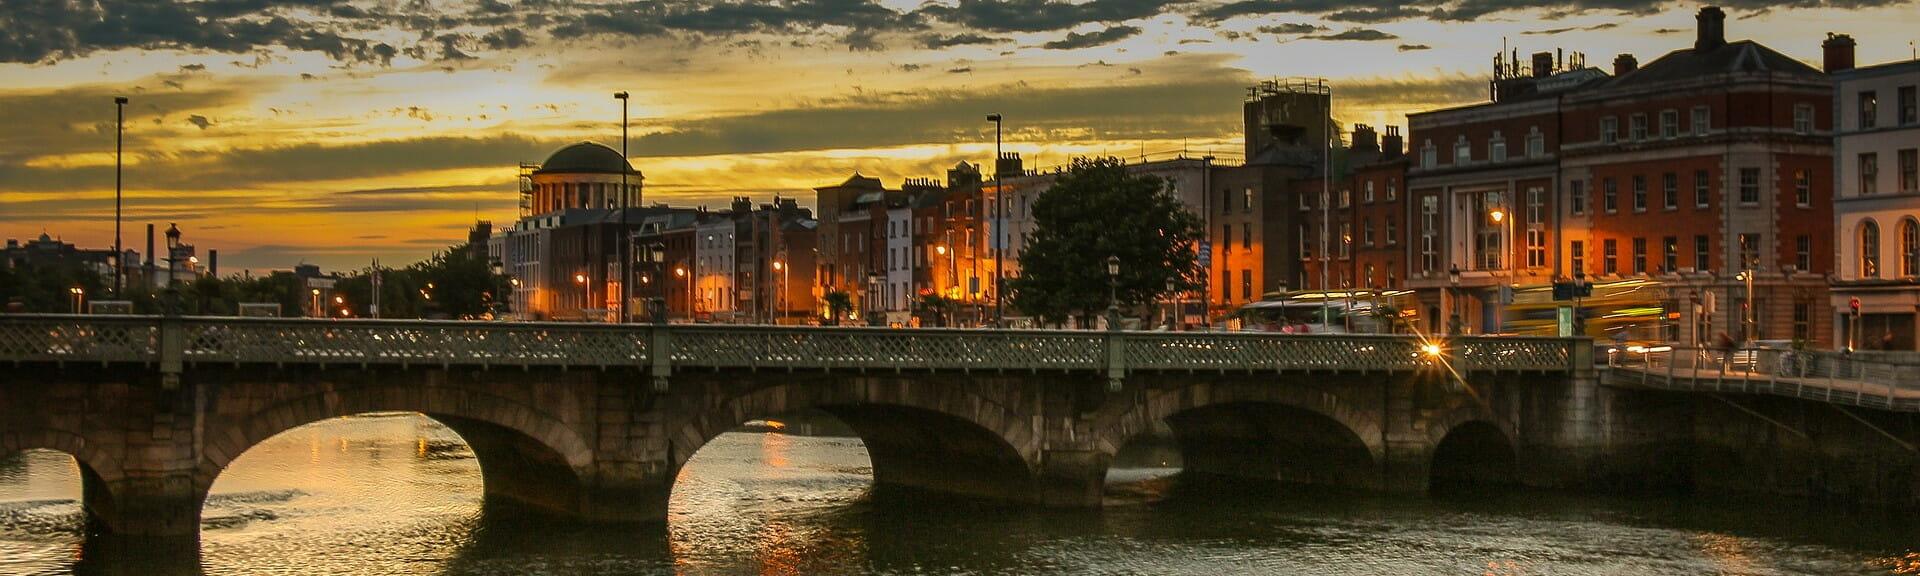 Klassenfahrt Dublin am Abend